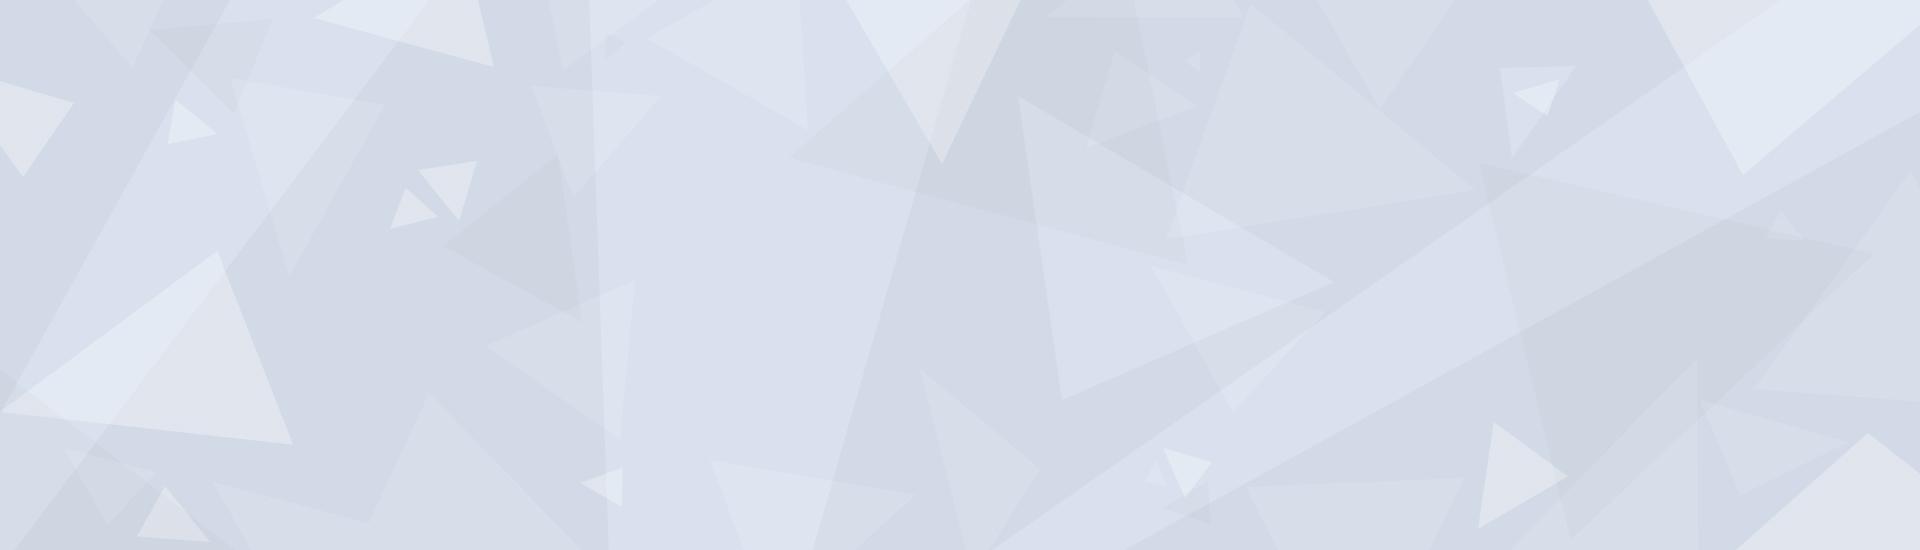 Kelto - VSLeague Online eSport